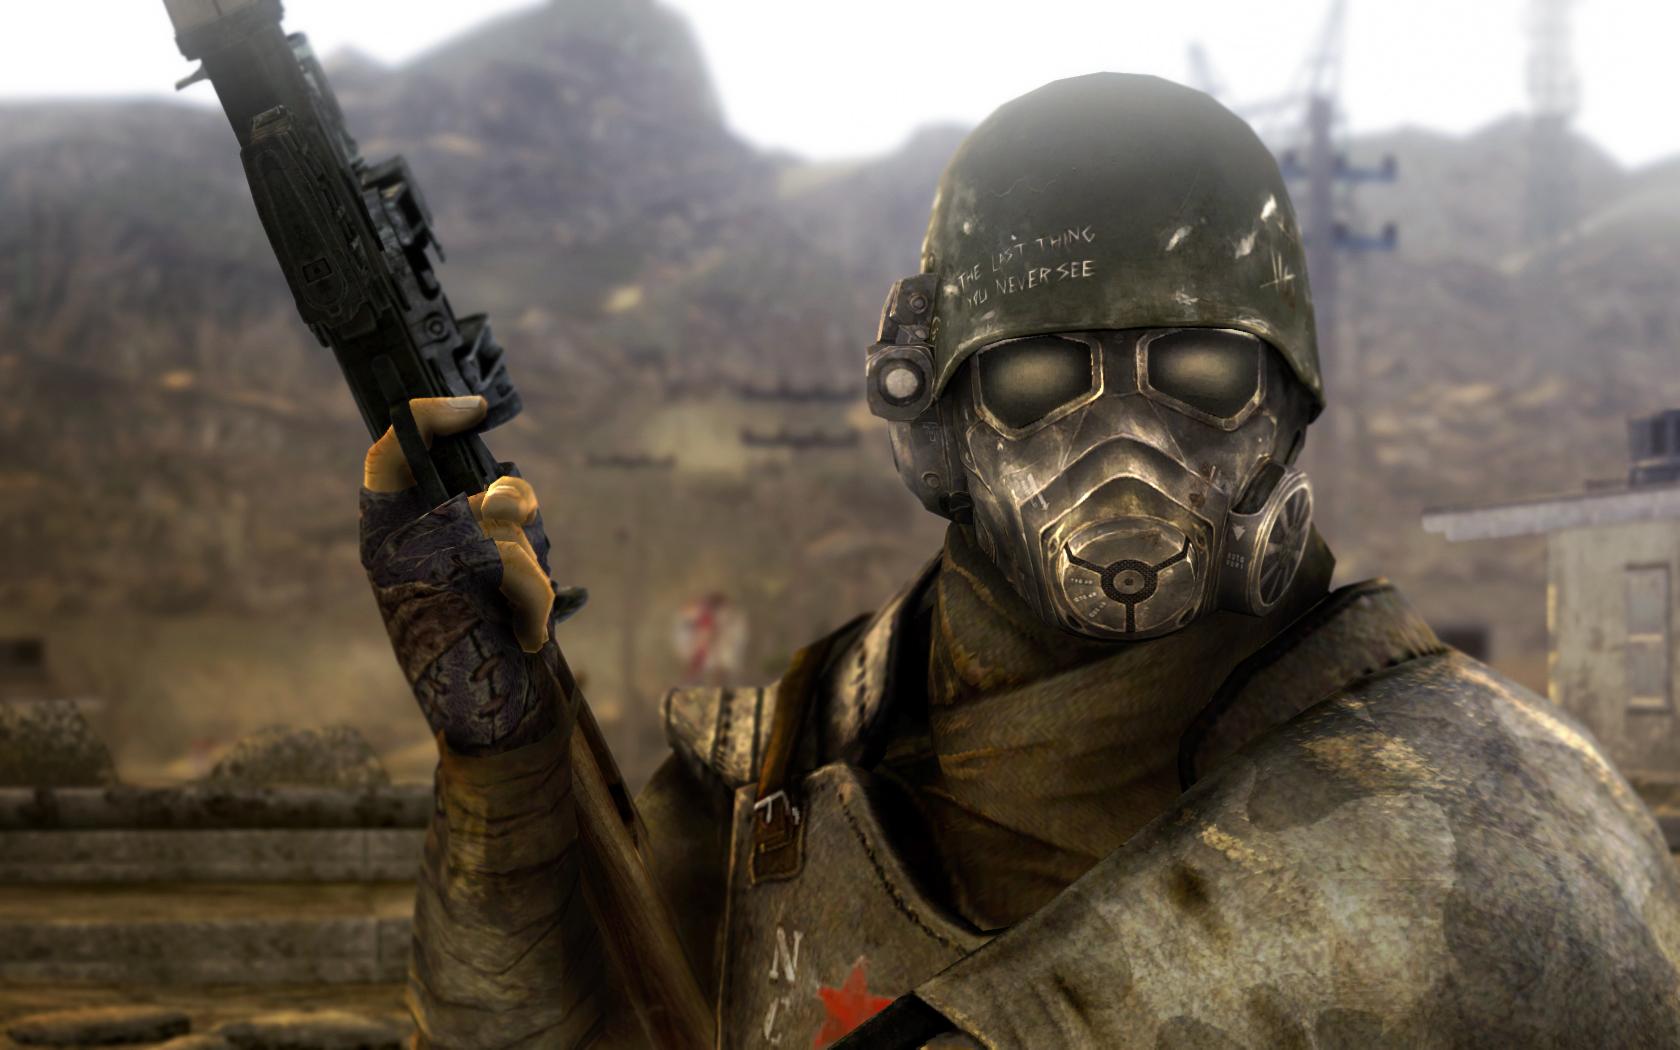 TFH 1st Recon Helmet для Fallout New Vegas для Fallout: New Vegas - Скриншот 3